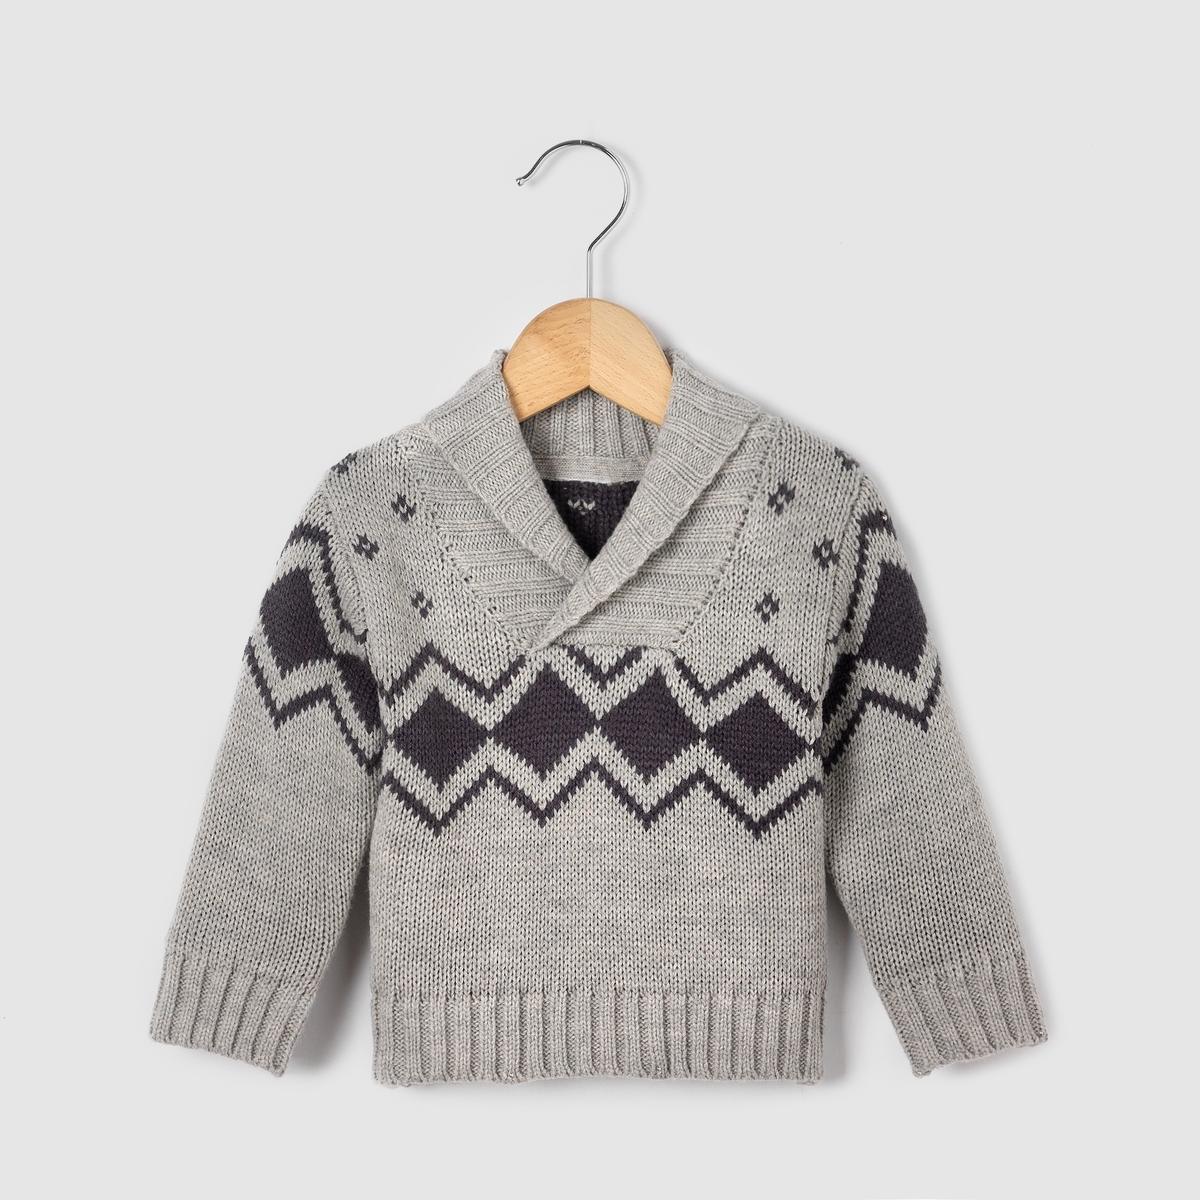 Пуловер жаккардовый, возраст 1 мес. - 3 года